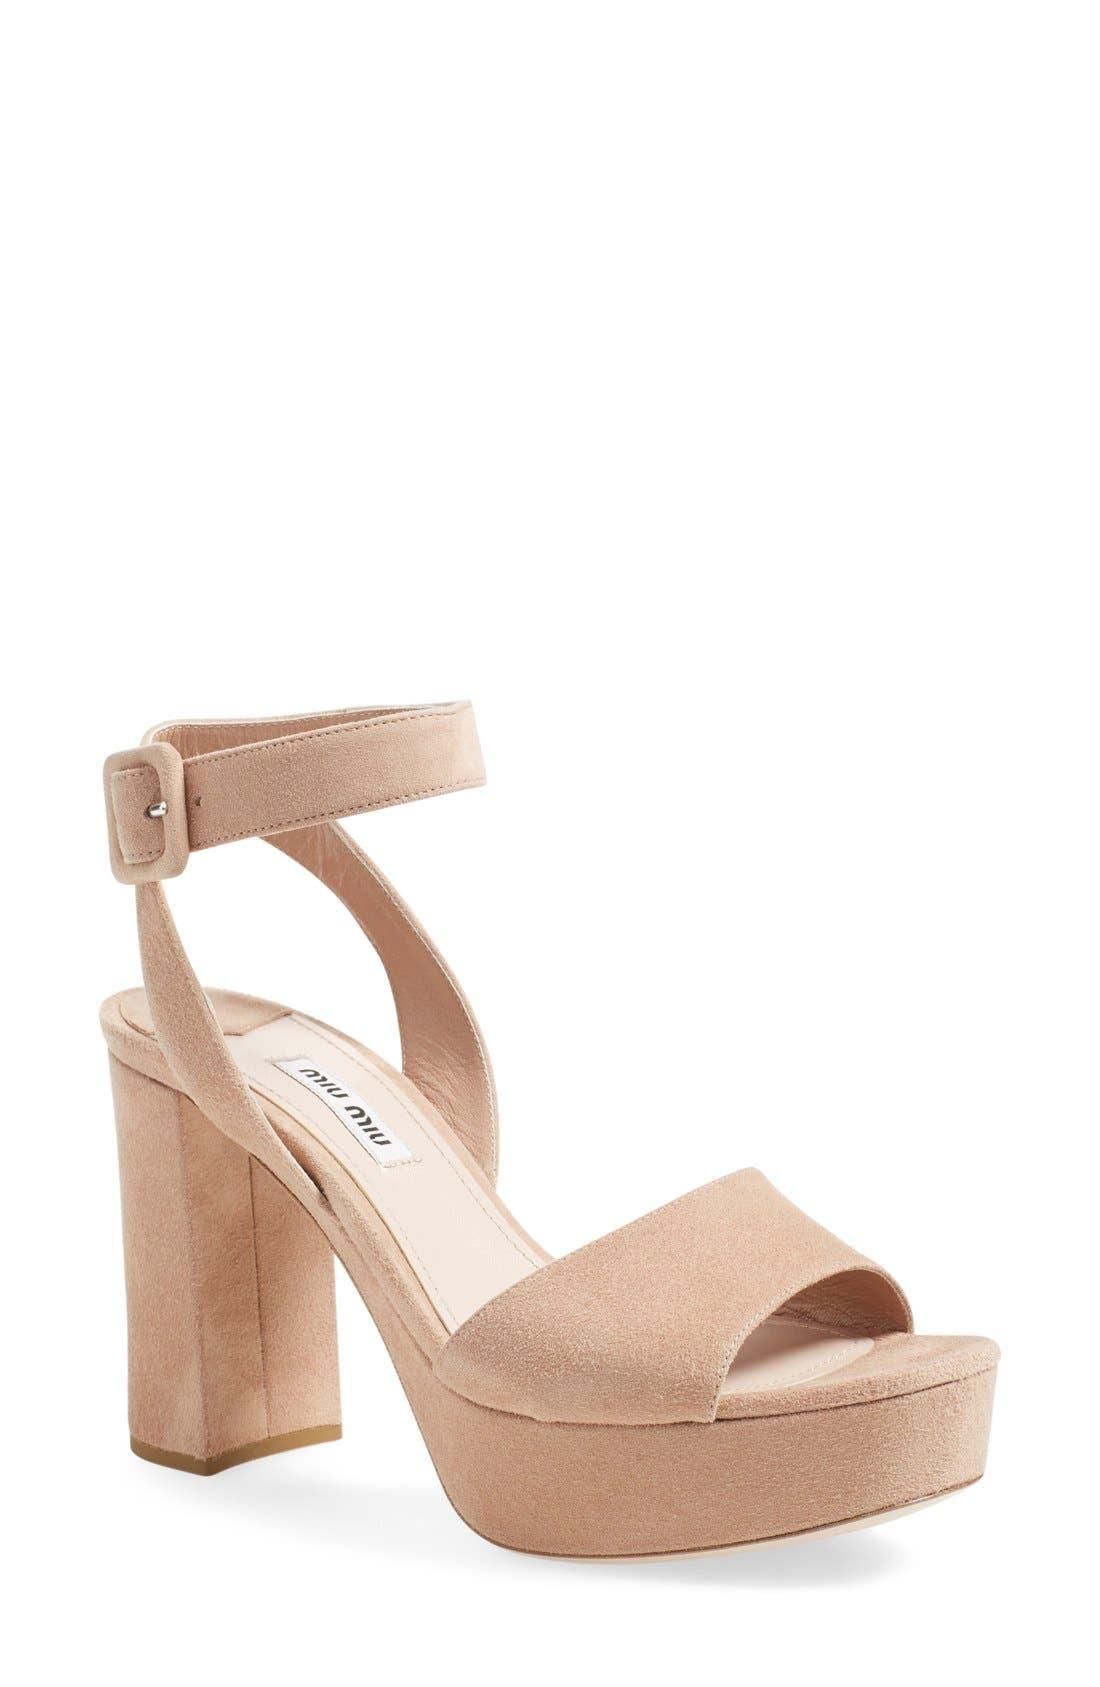 'Sandali' Ankle Strap Sandal,                             Main thumbnail 3, color,